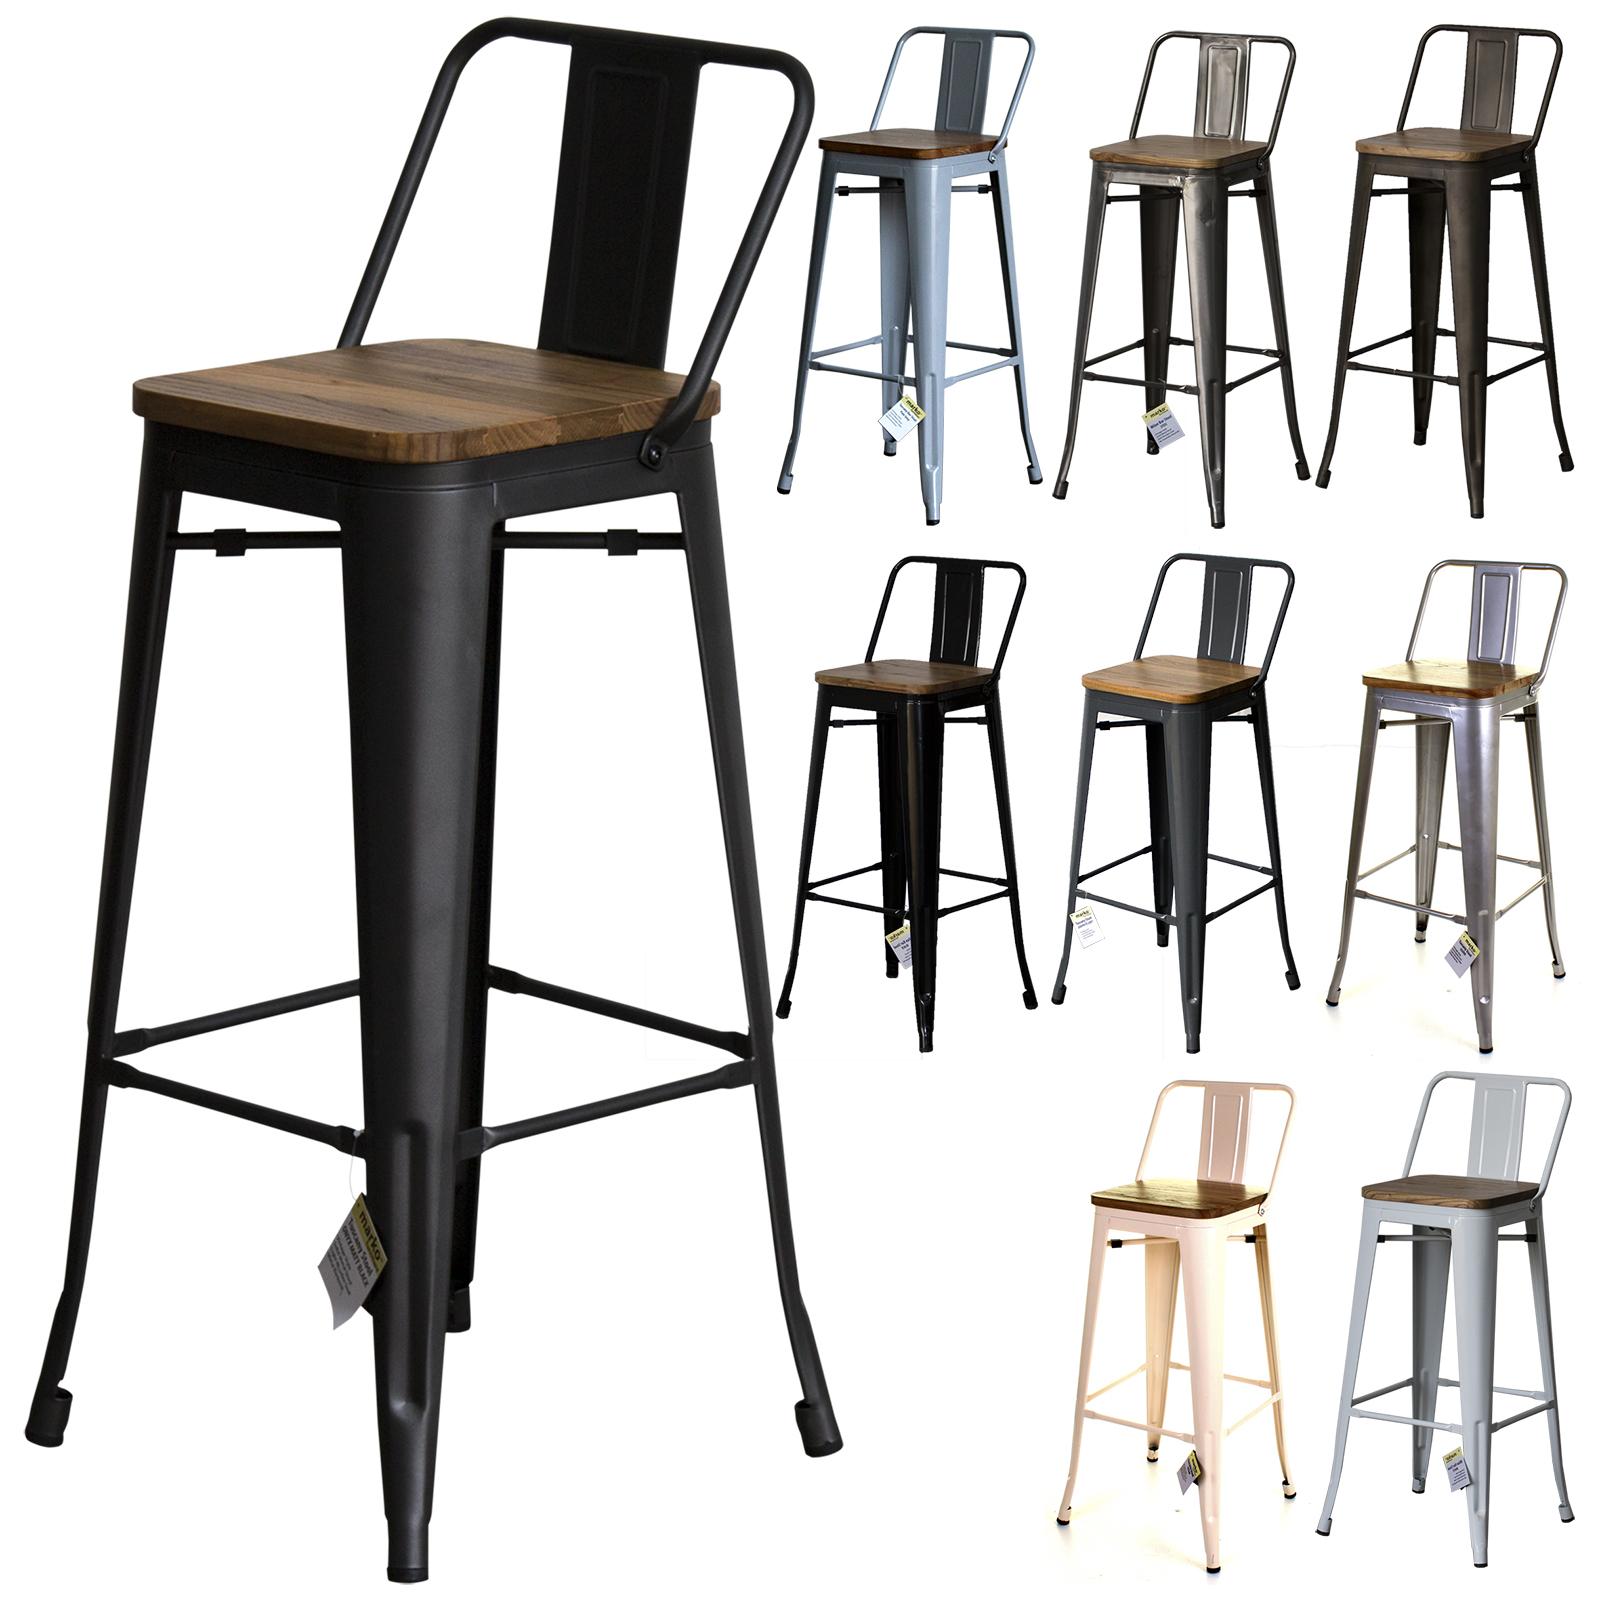 metal industrial bar stools breakfast kitchen bistro cafe